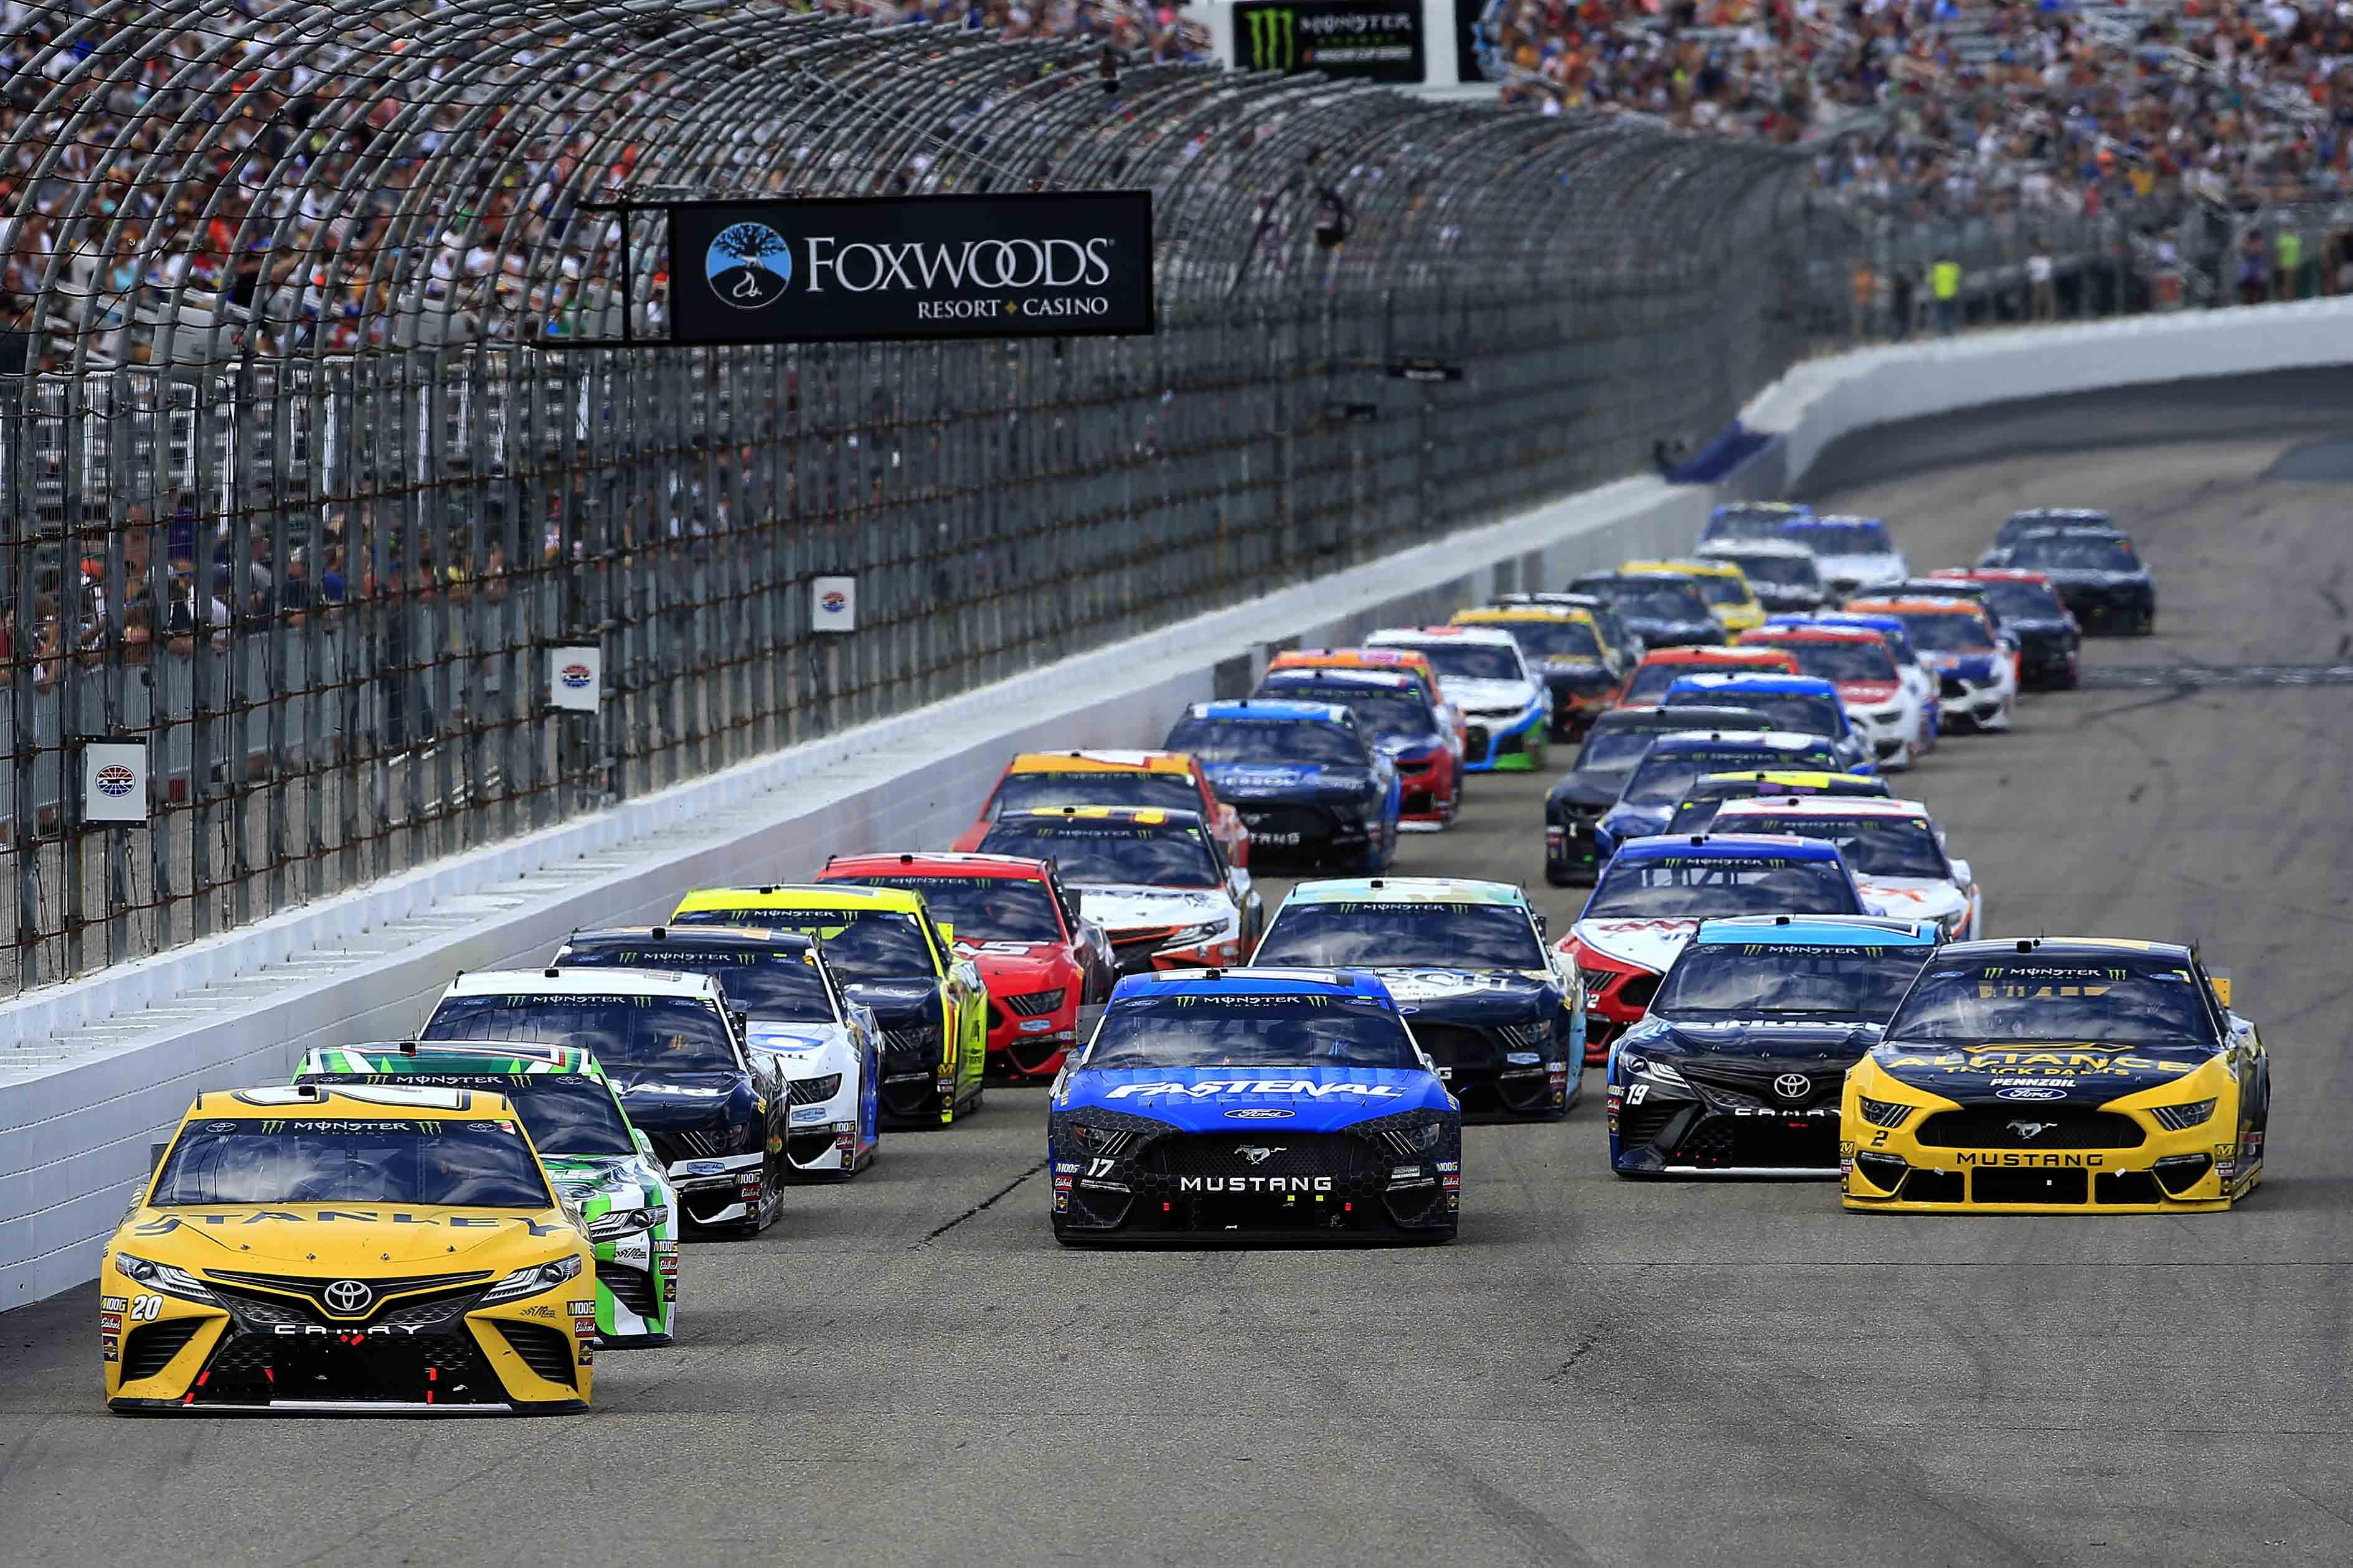 Erik Jones, Kyle Busch, Ricky Stenhouse Jr, Martin Truex Jr and Brad Keselowski at New Hampshire Motor Speedway - NASCAR Cup Series